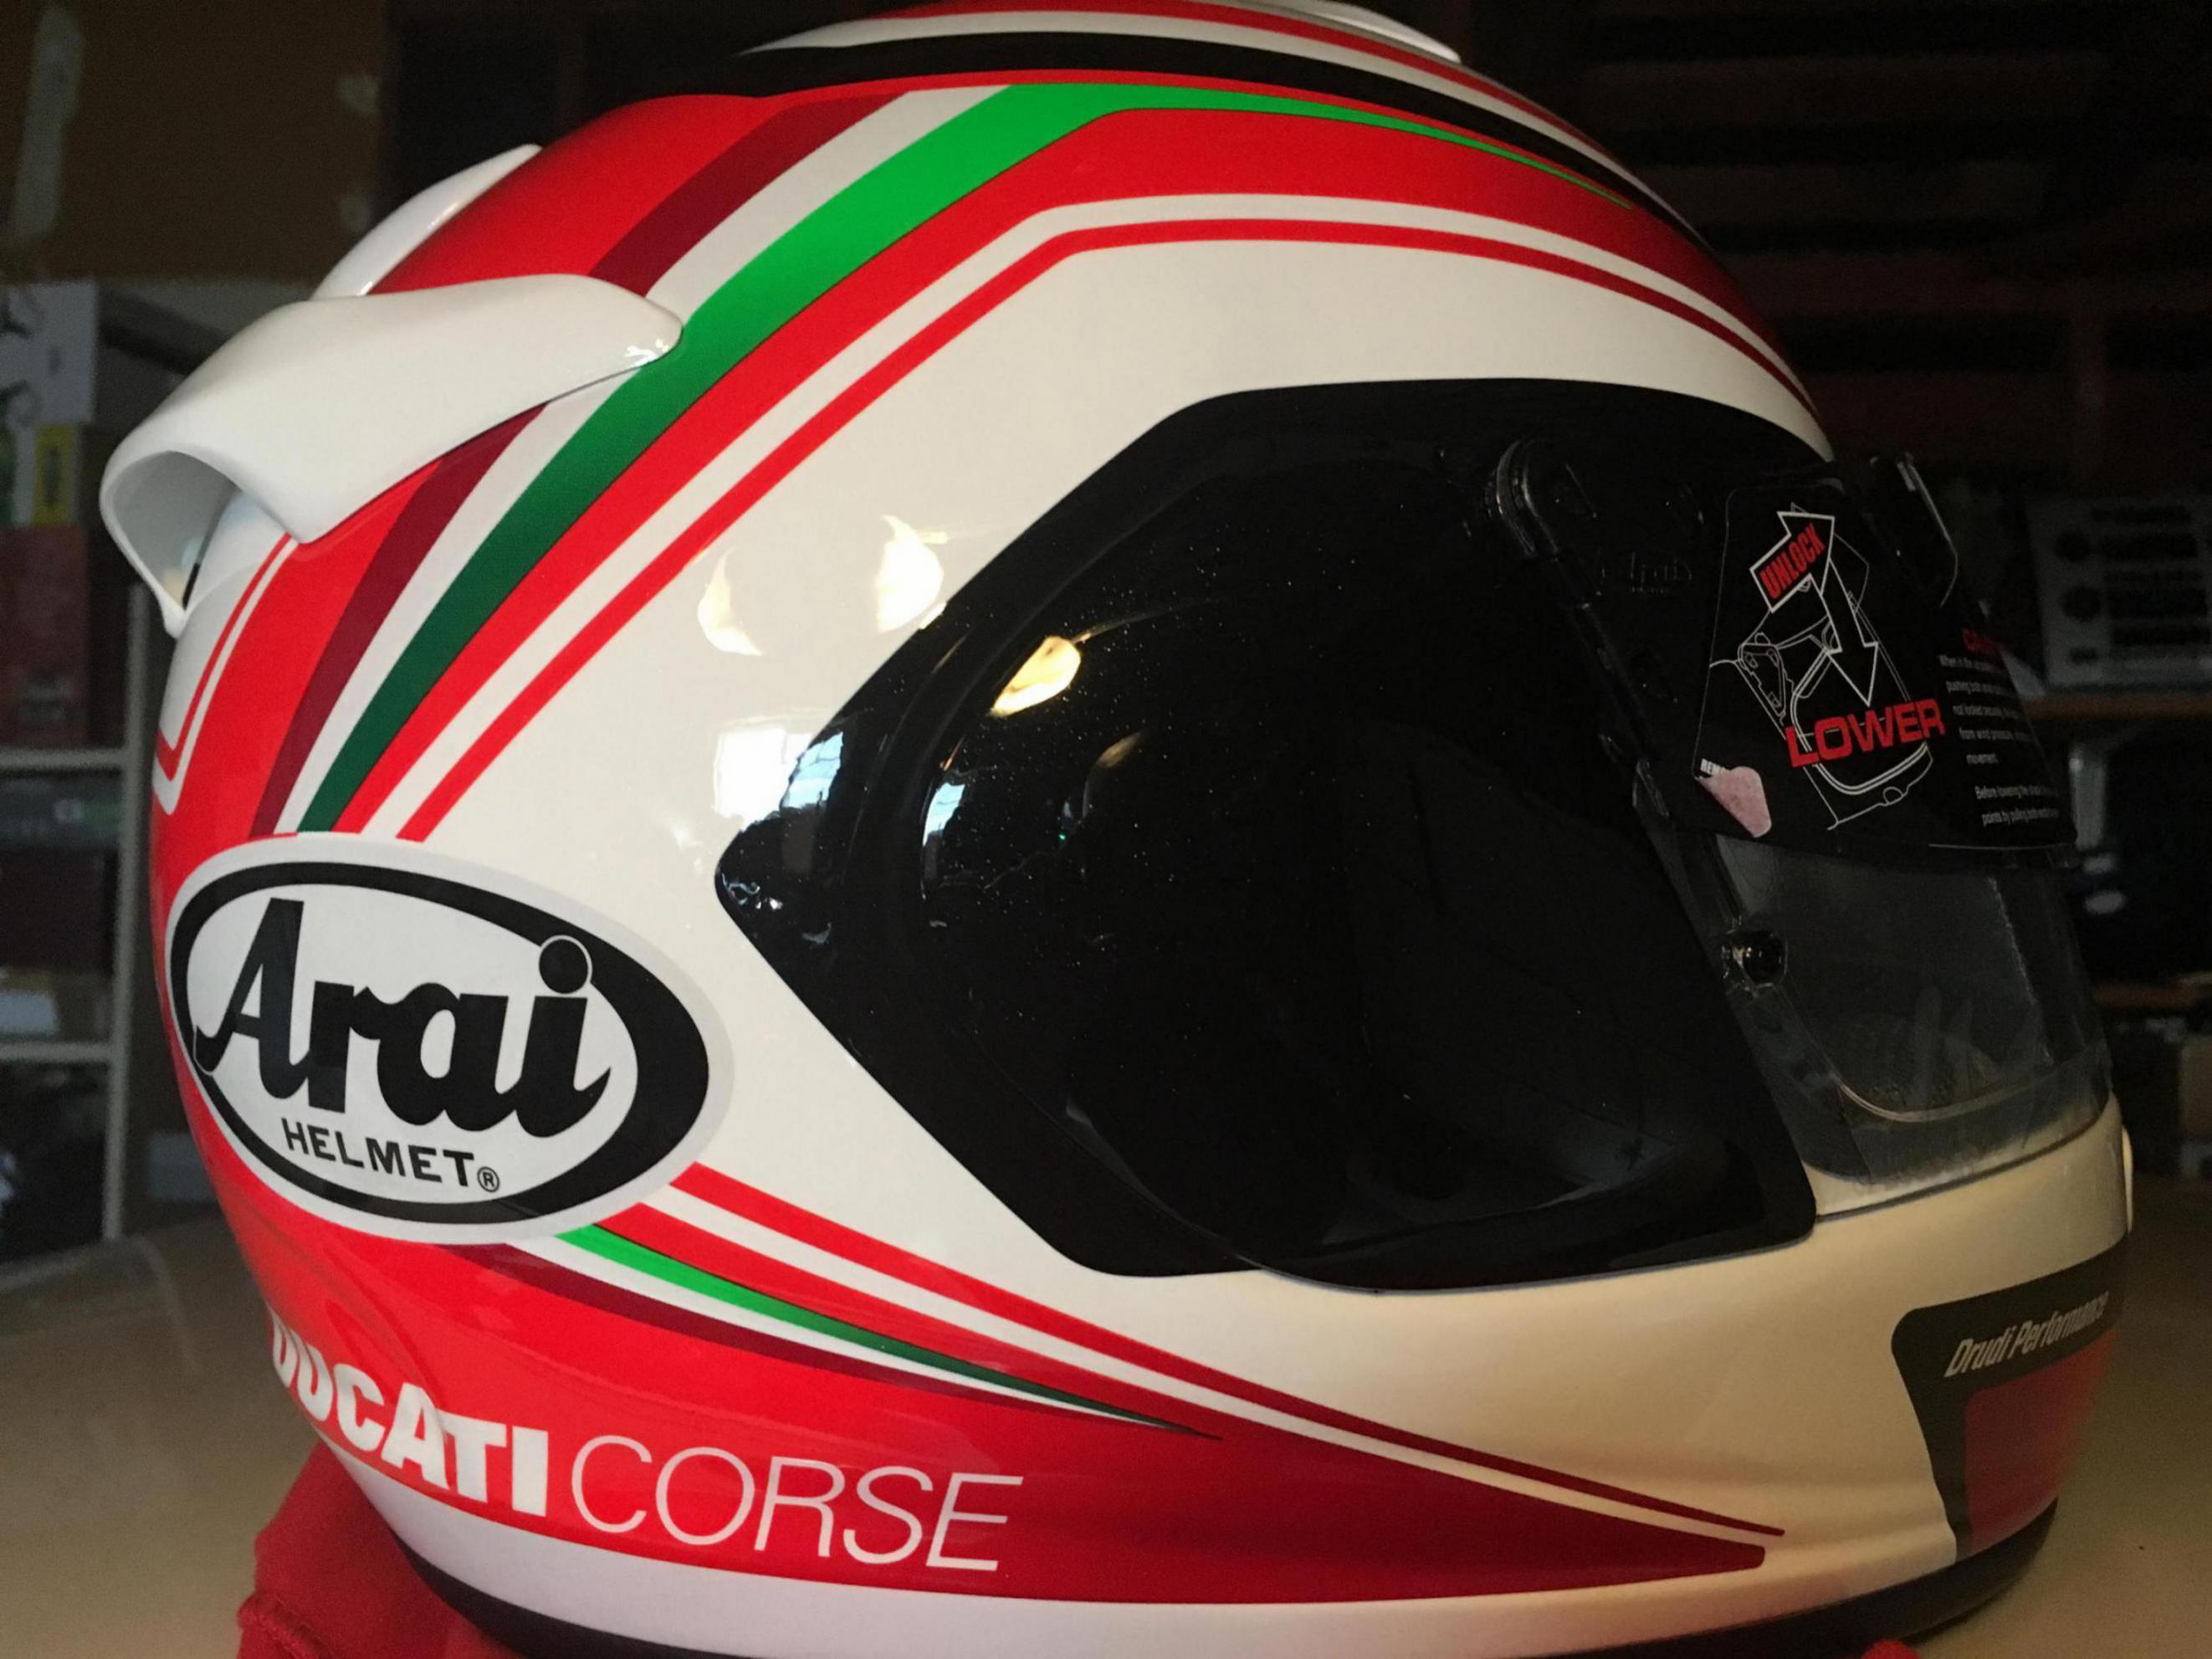 Arai Ducati SBK 2 corse large-img_2648_1528551132662.jpg